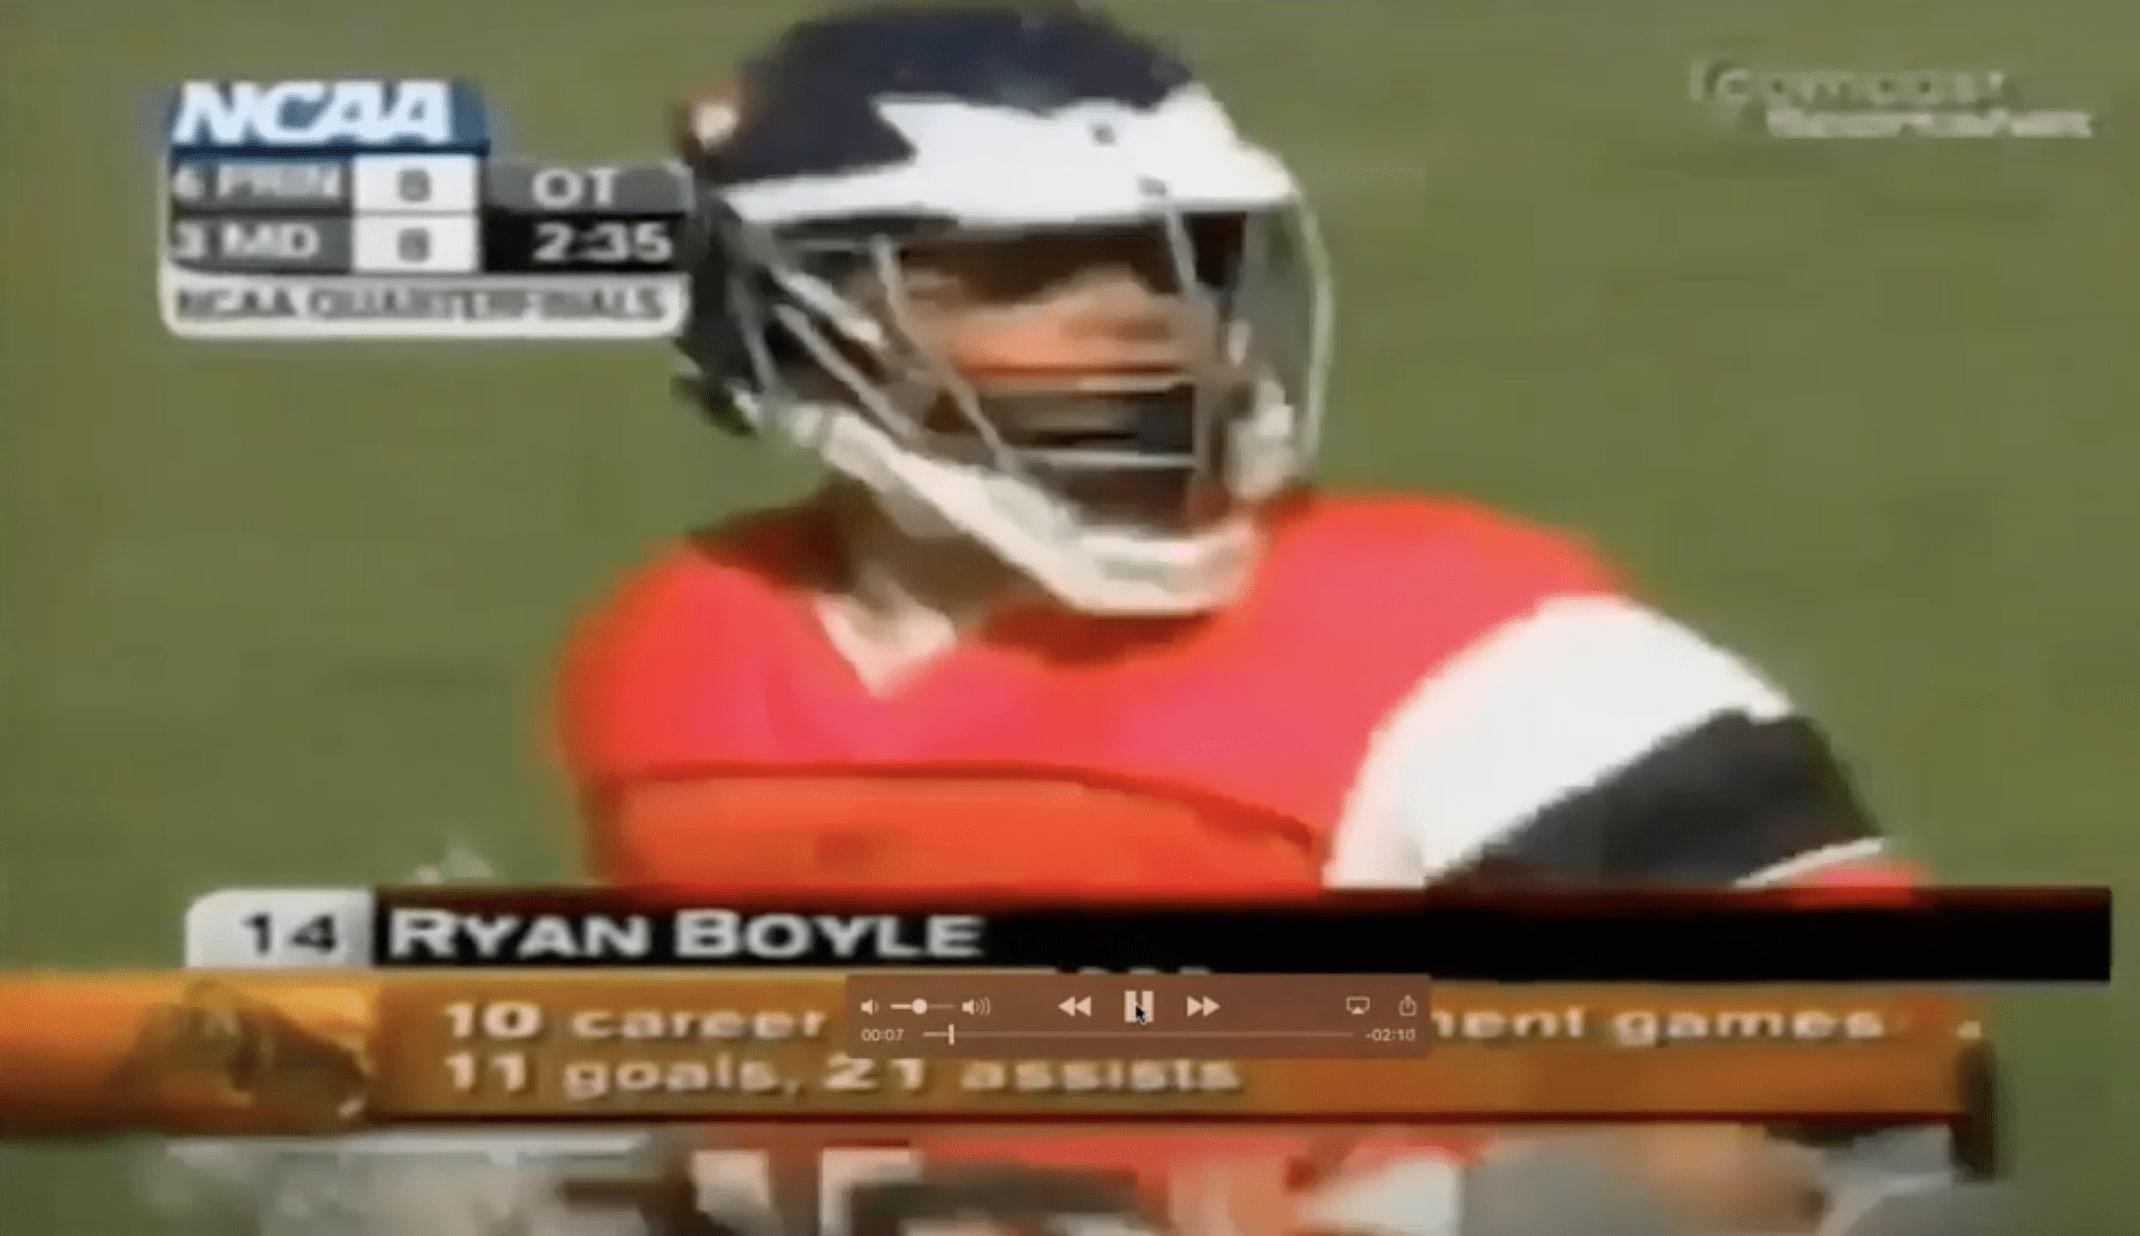 Watch Ryan Boyle's '04 NCAA Quarterfinals Highlights with Ryan Boyle!